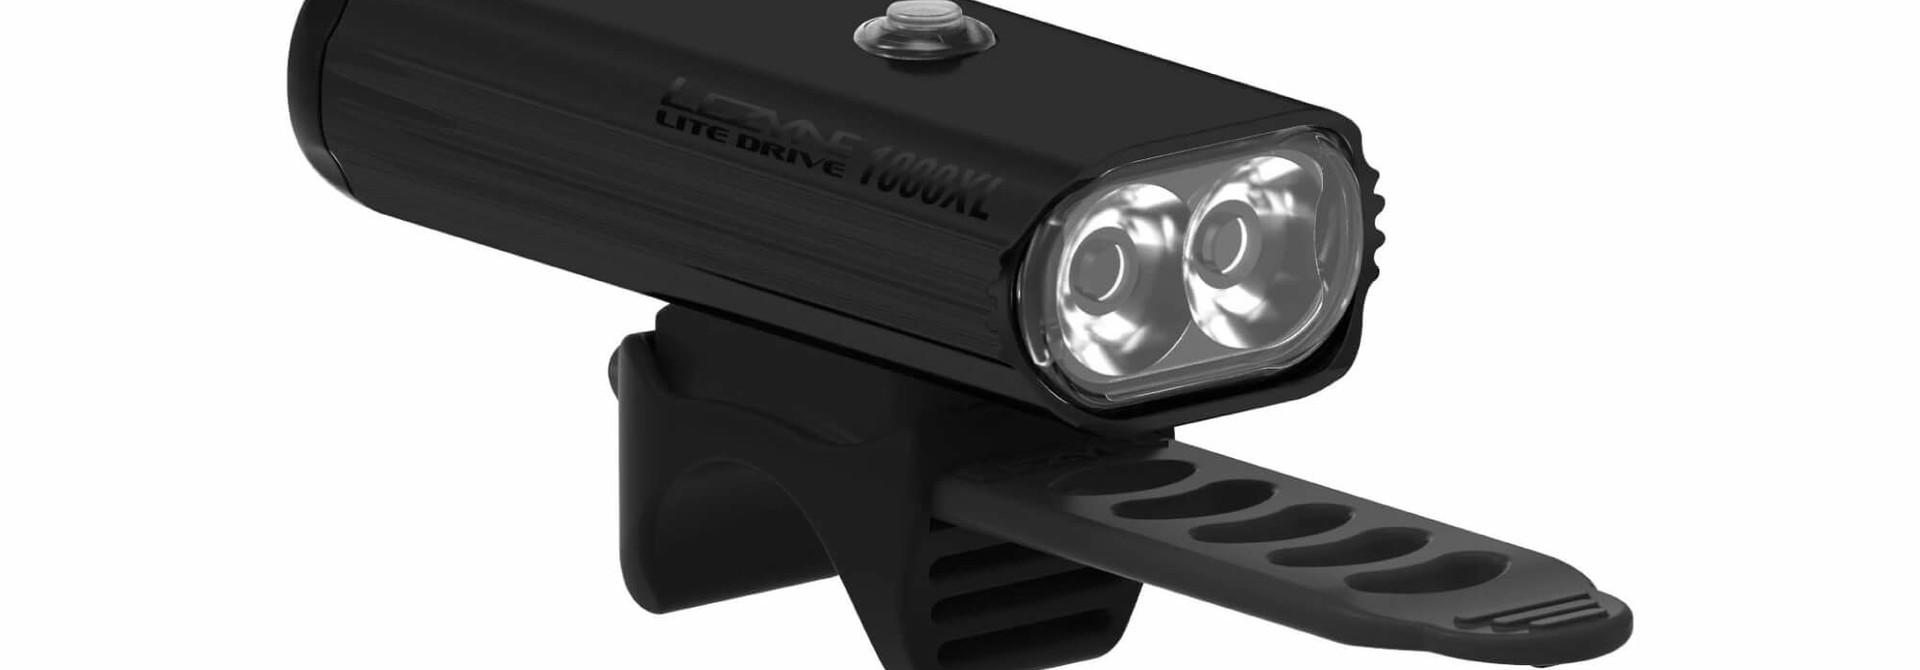 Lite Drive 1000XL - Blk/Higlos